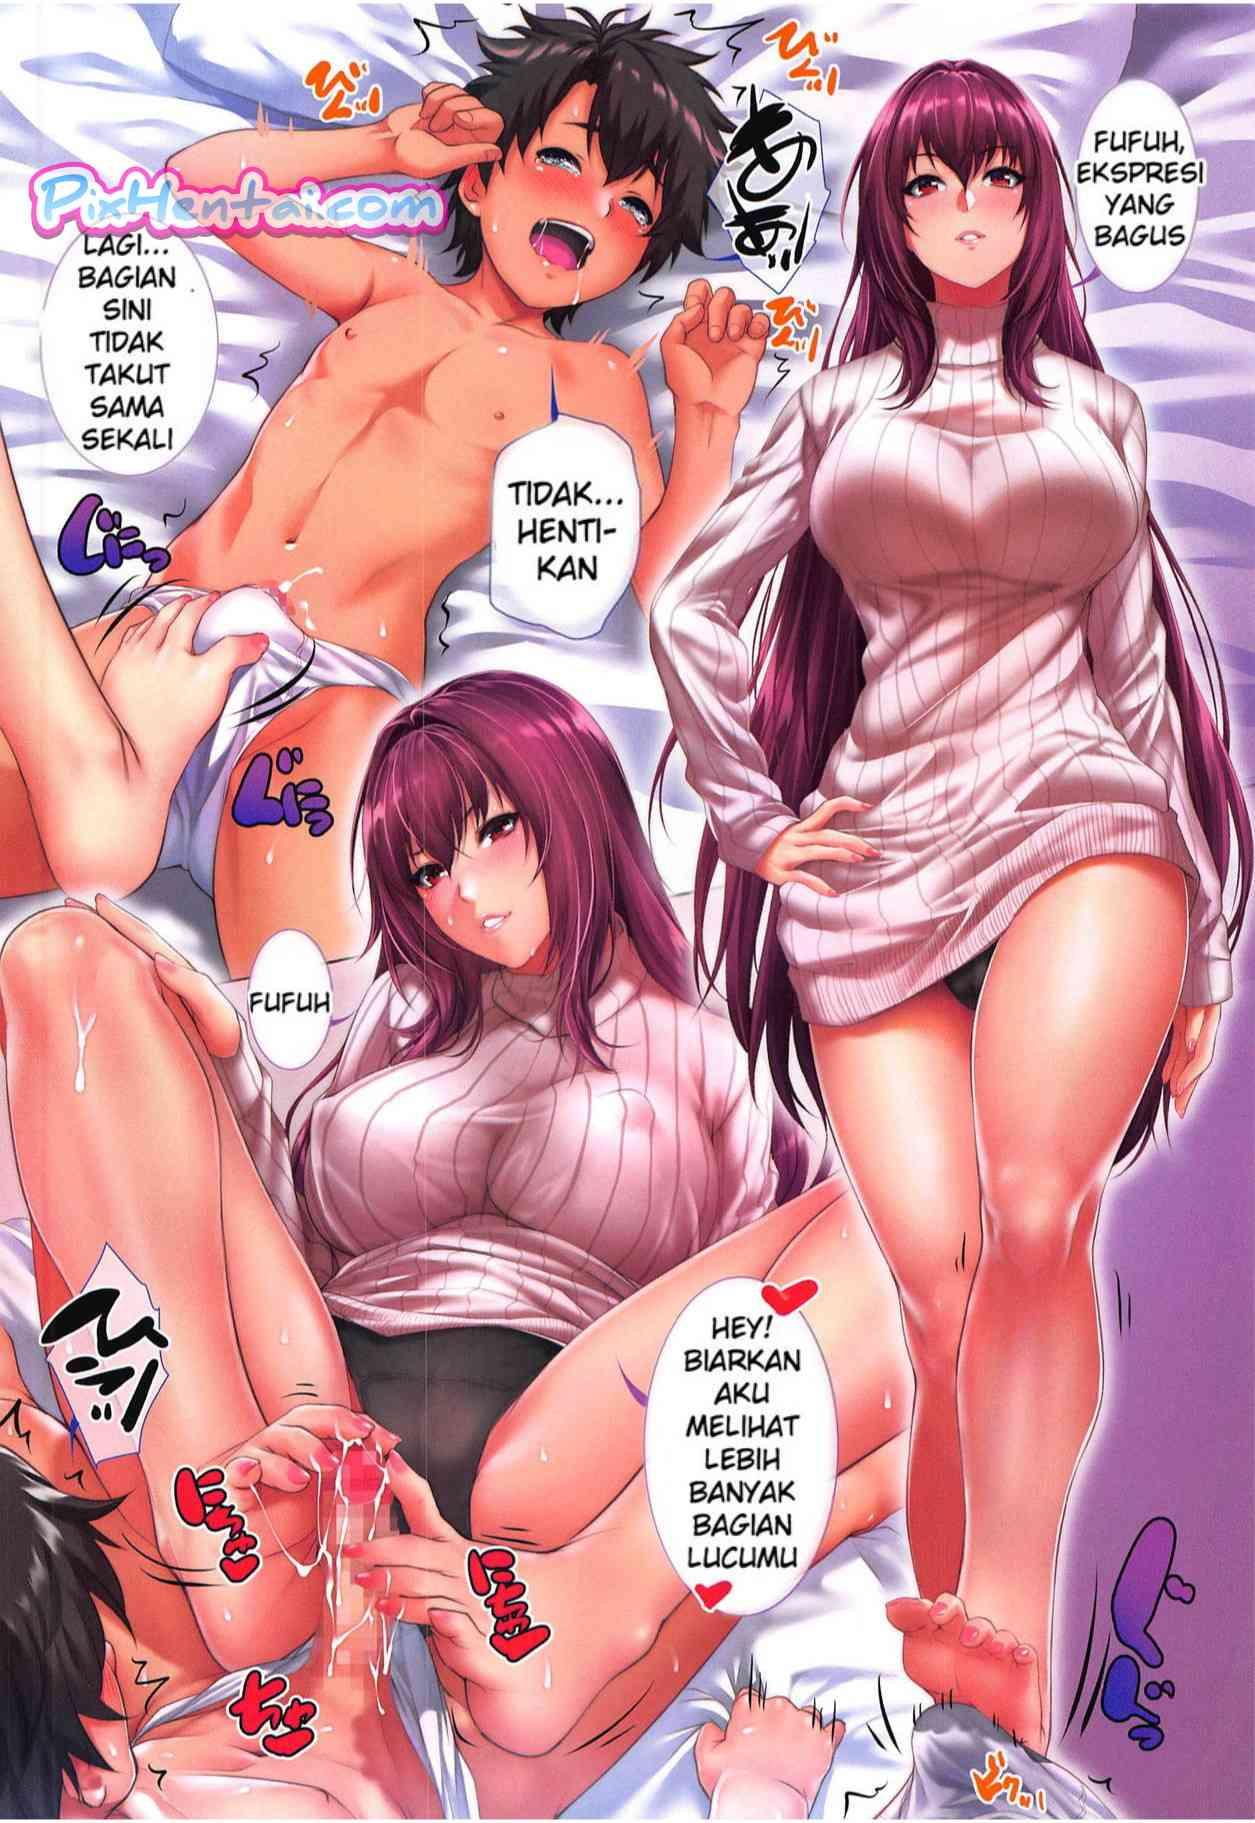 Komik Hentai Ritsuka-kun's Misfortune? The Targeted Lamb!! Manga Sex Porn Doujin XXX Bokep 12